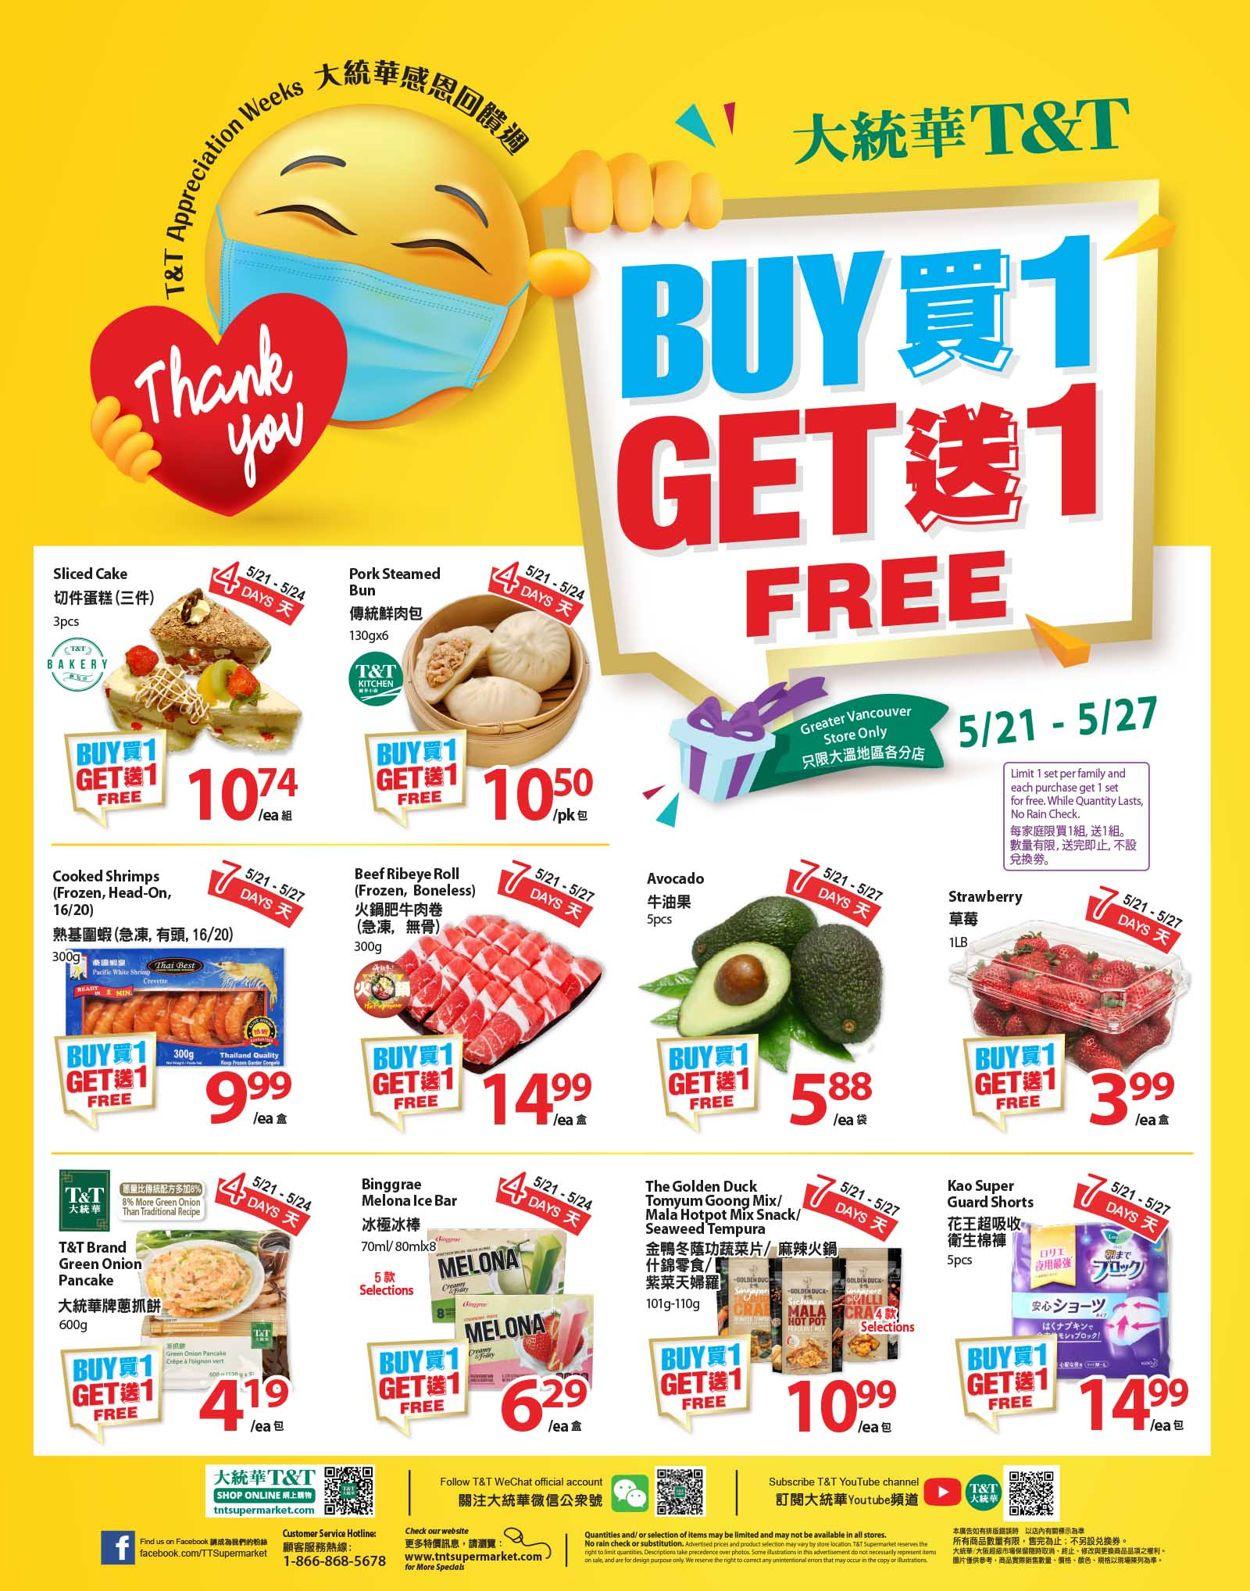 T&T Supermarket - British Columbia Flyer - 05/21-05/27/2021